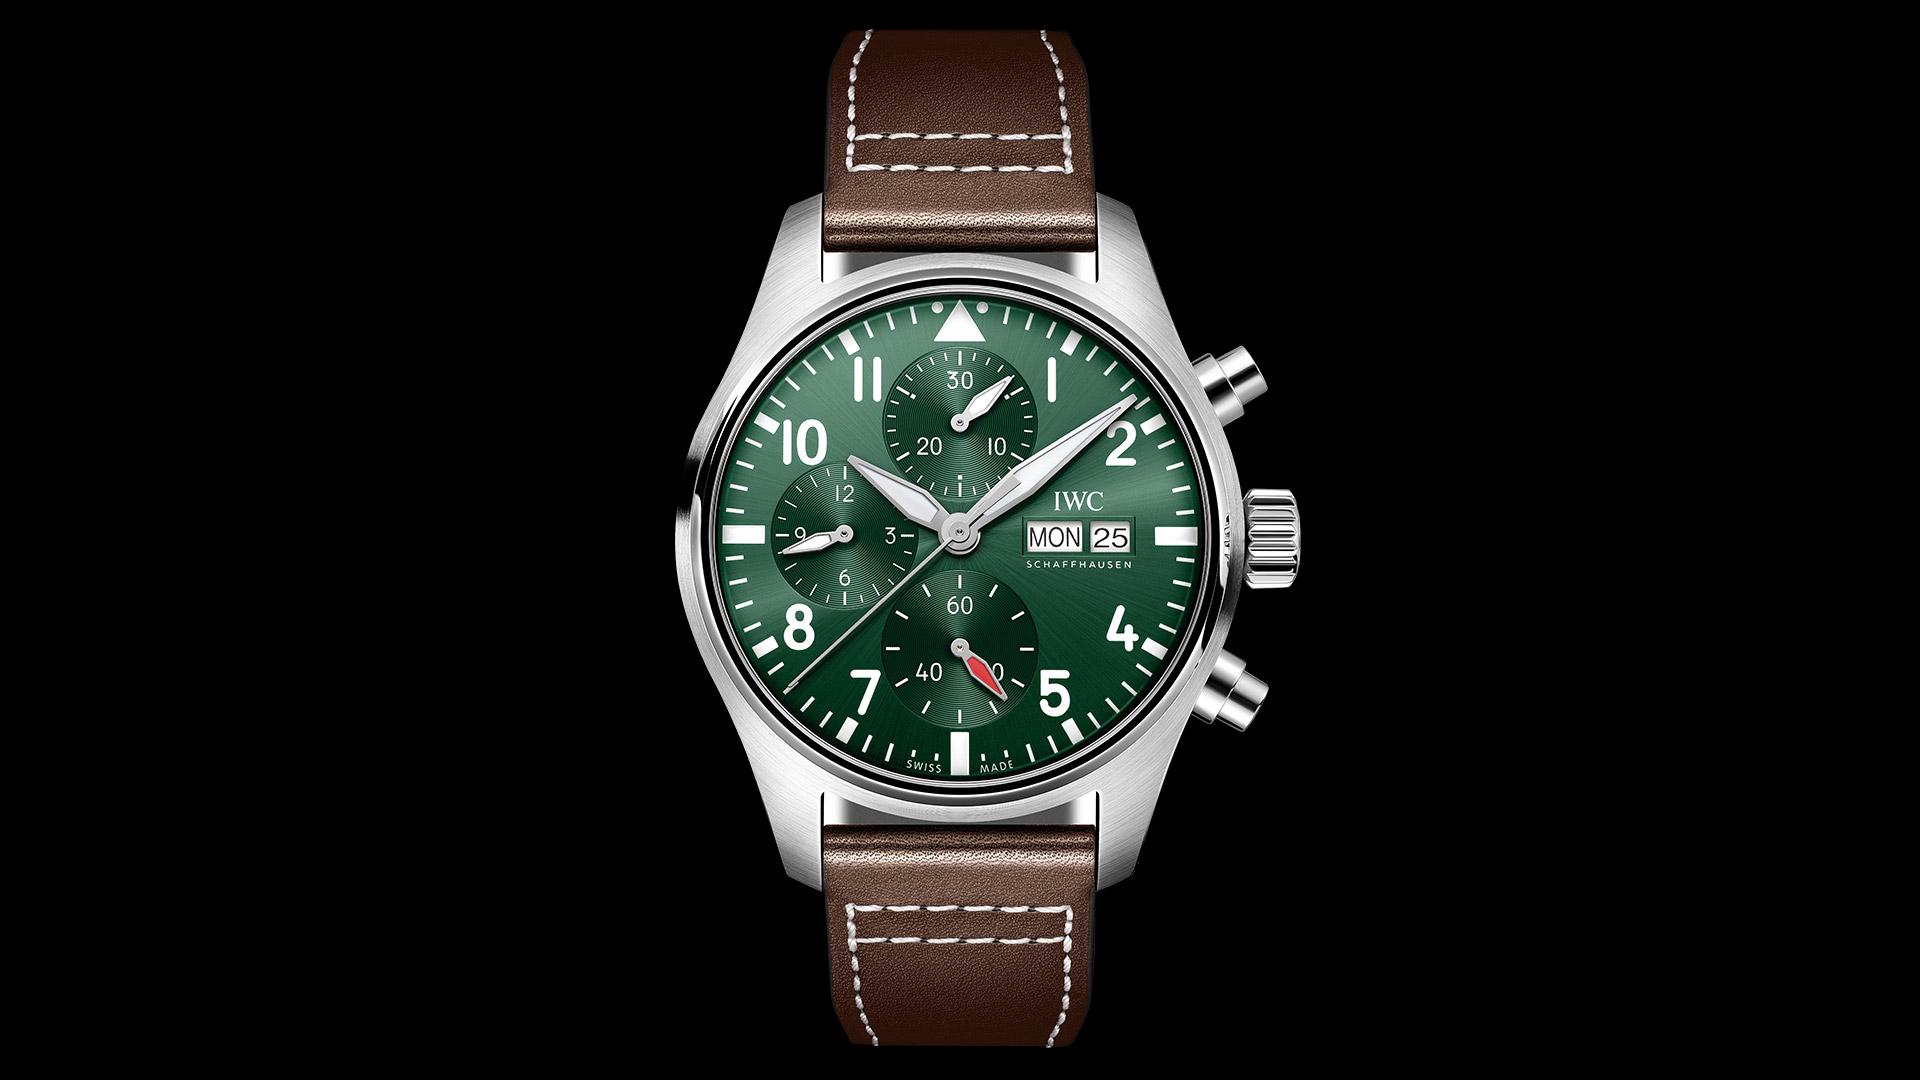 IWC-Pilot's-Watch-Chronograph-41mm